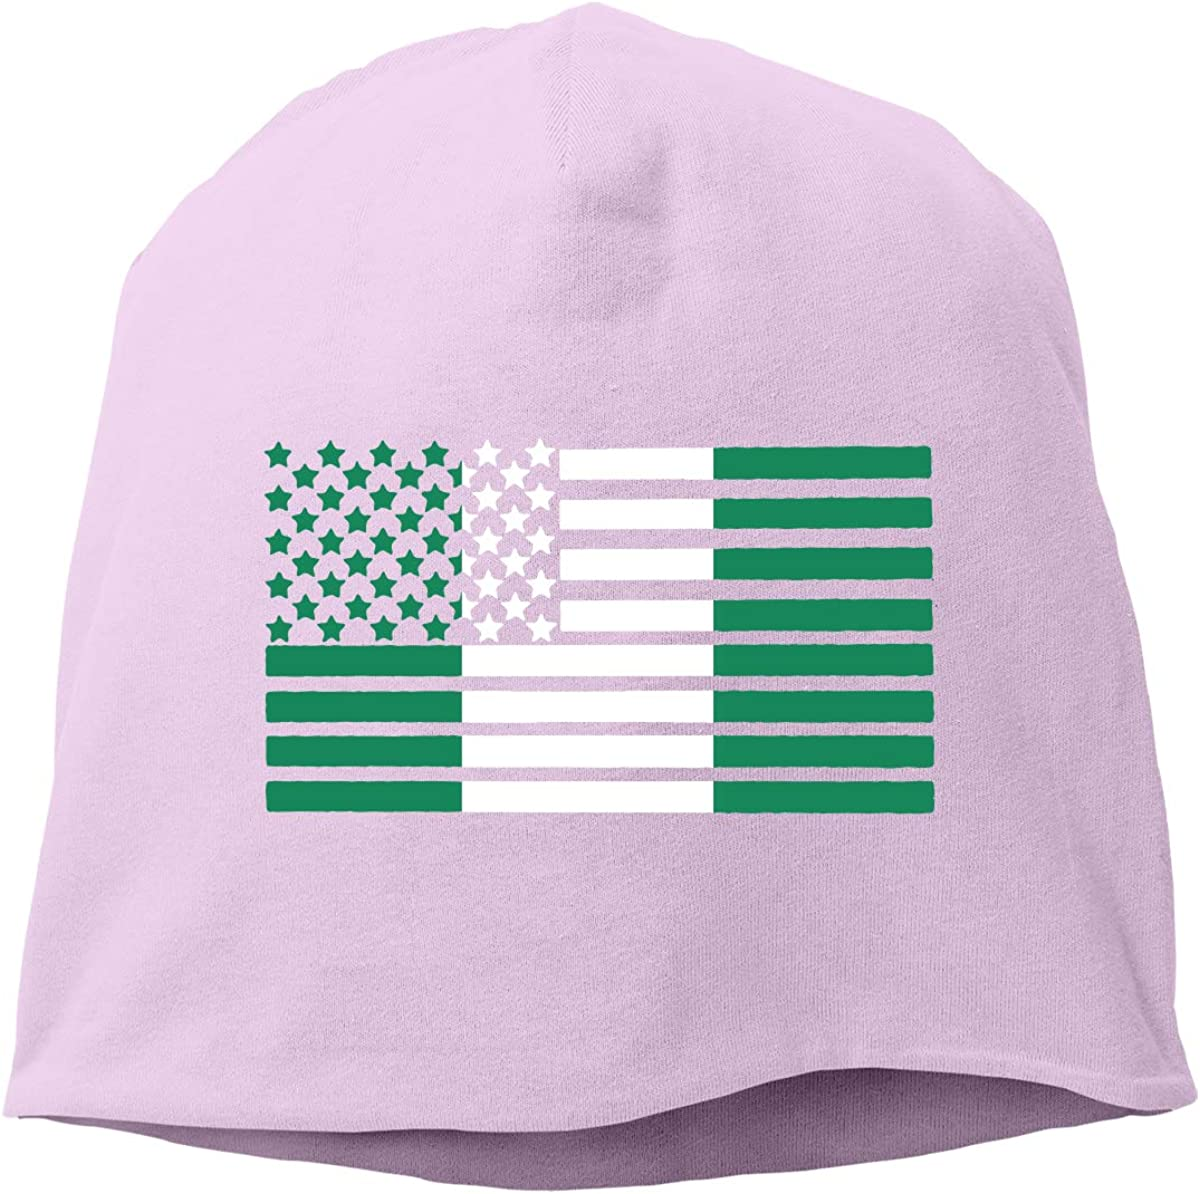 AZXGGV Men Women Nigerian Flag Map Soft Knit Hats